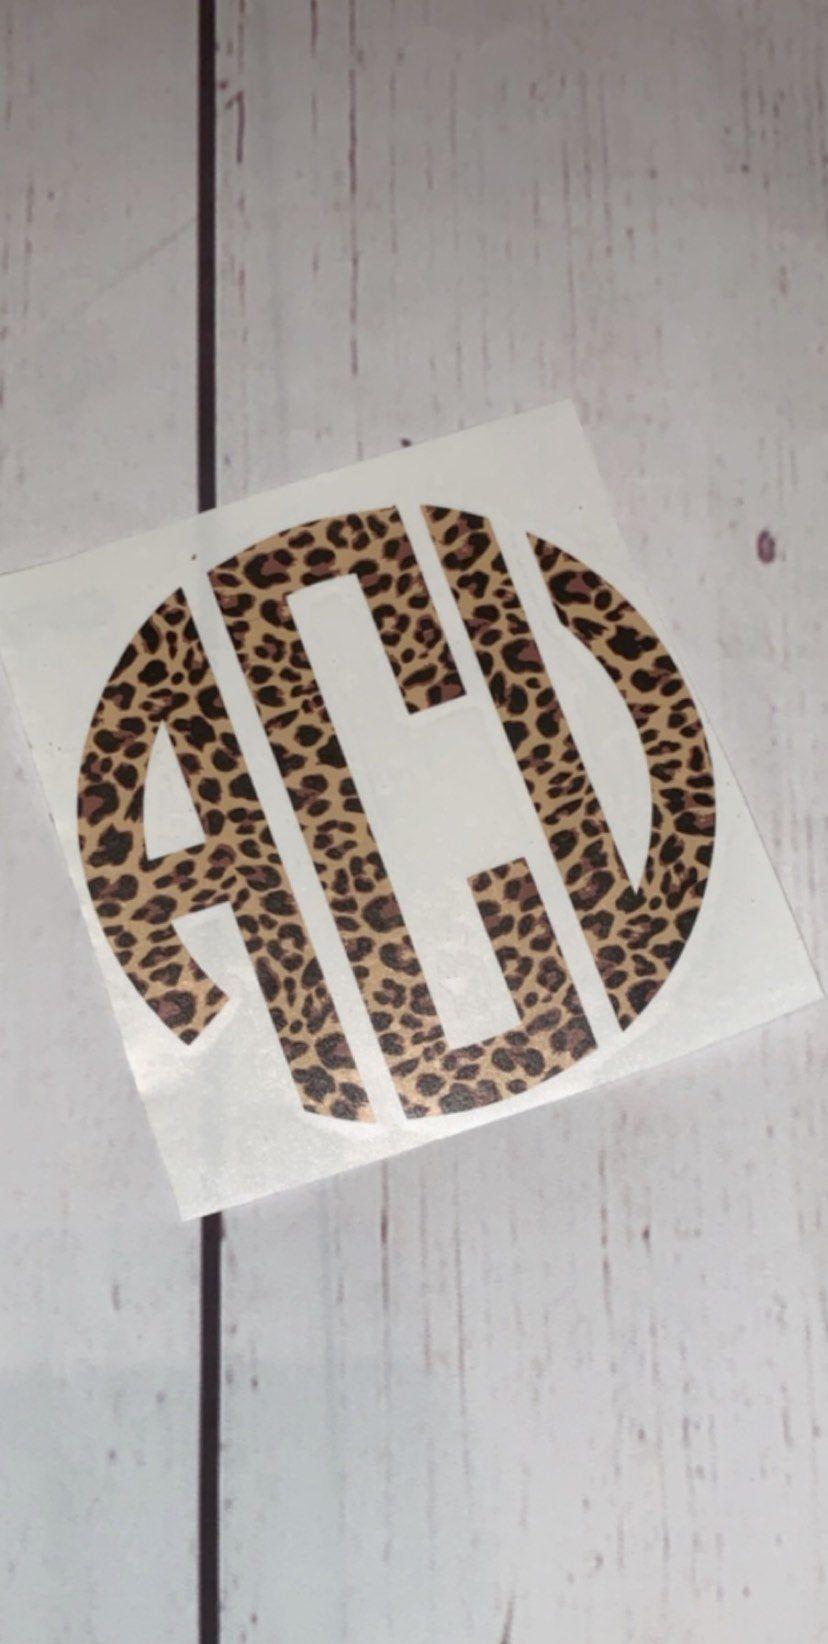 Cheetah Print Monogram Leopard Print Monogram Vinyl Monogram Etsy Cute Car Decals Car Monogram Decal Car Decals Vinyl [ 1644 x 828 Pixel ]